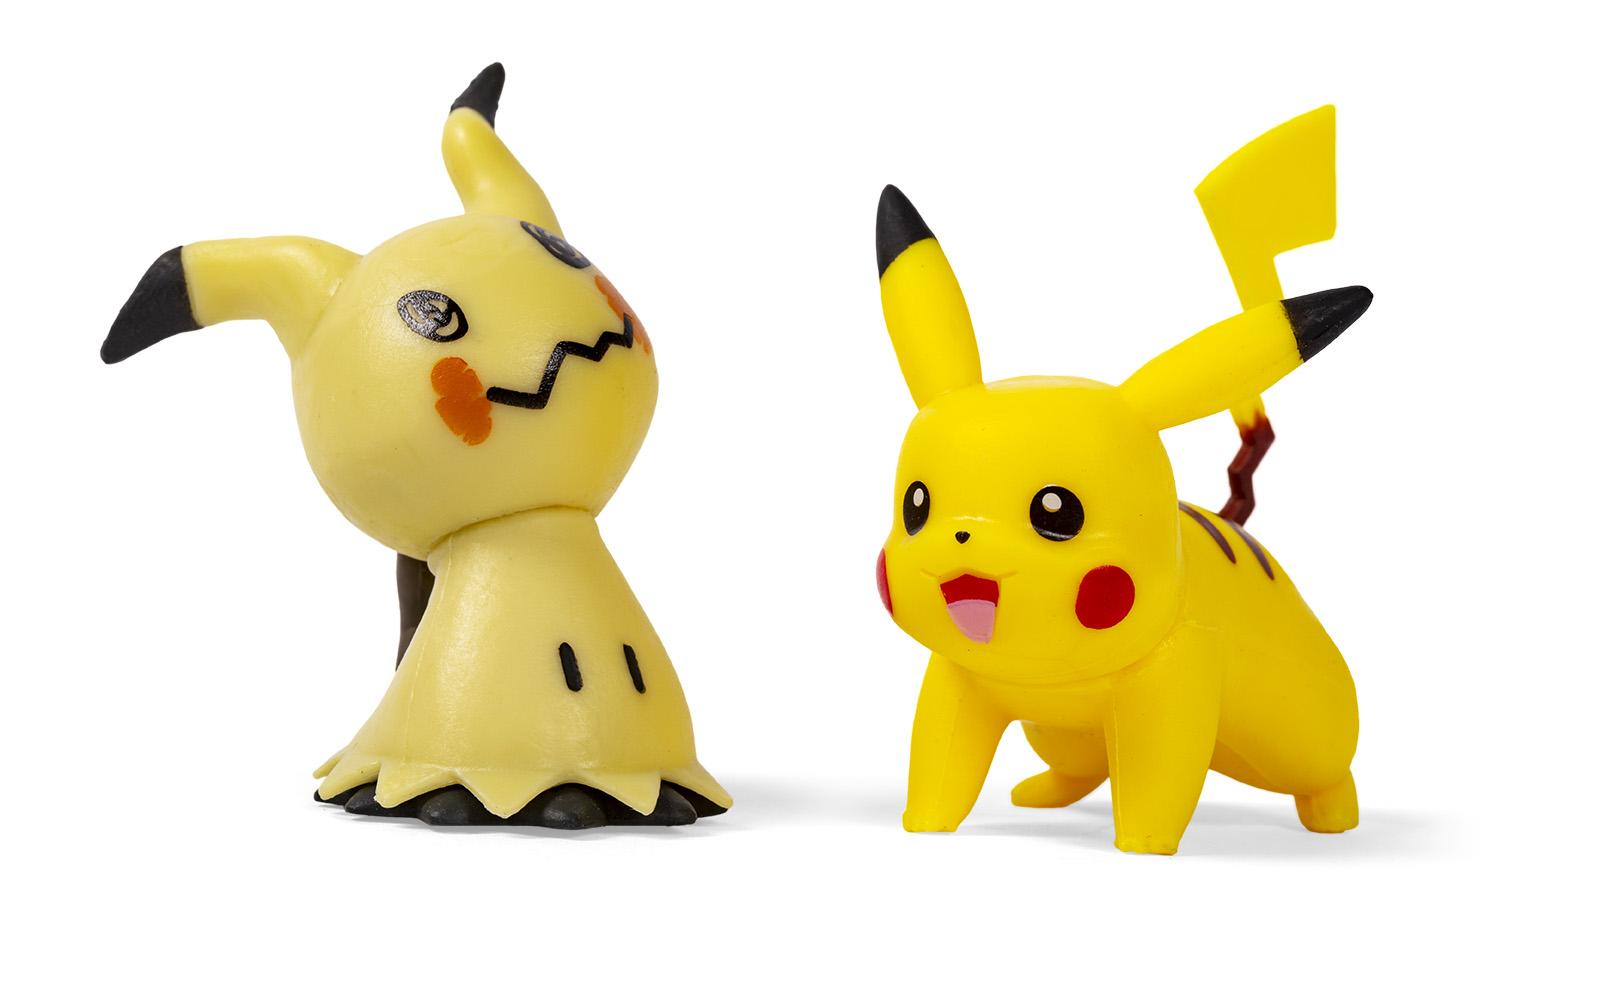 Pokémon - Battle Figure Pack - Mimigma & Pikachu